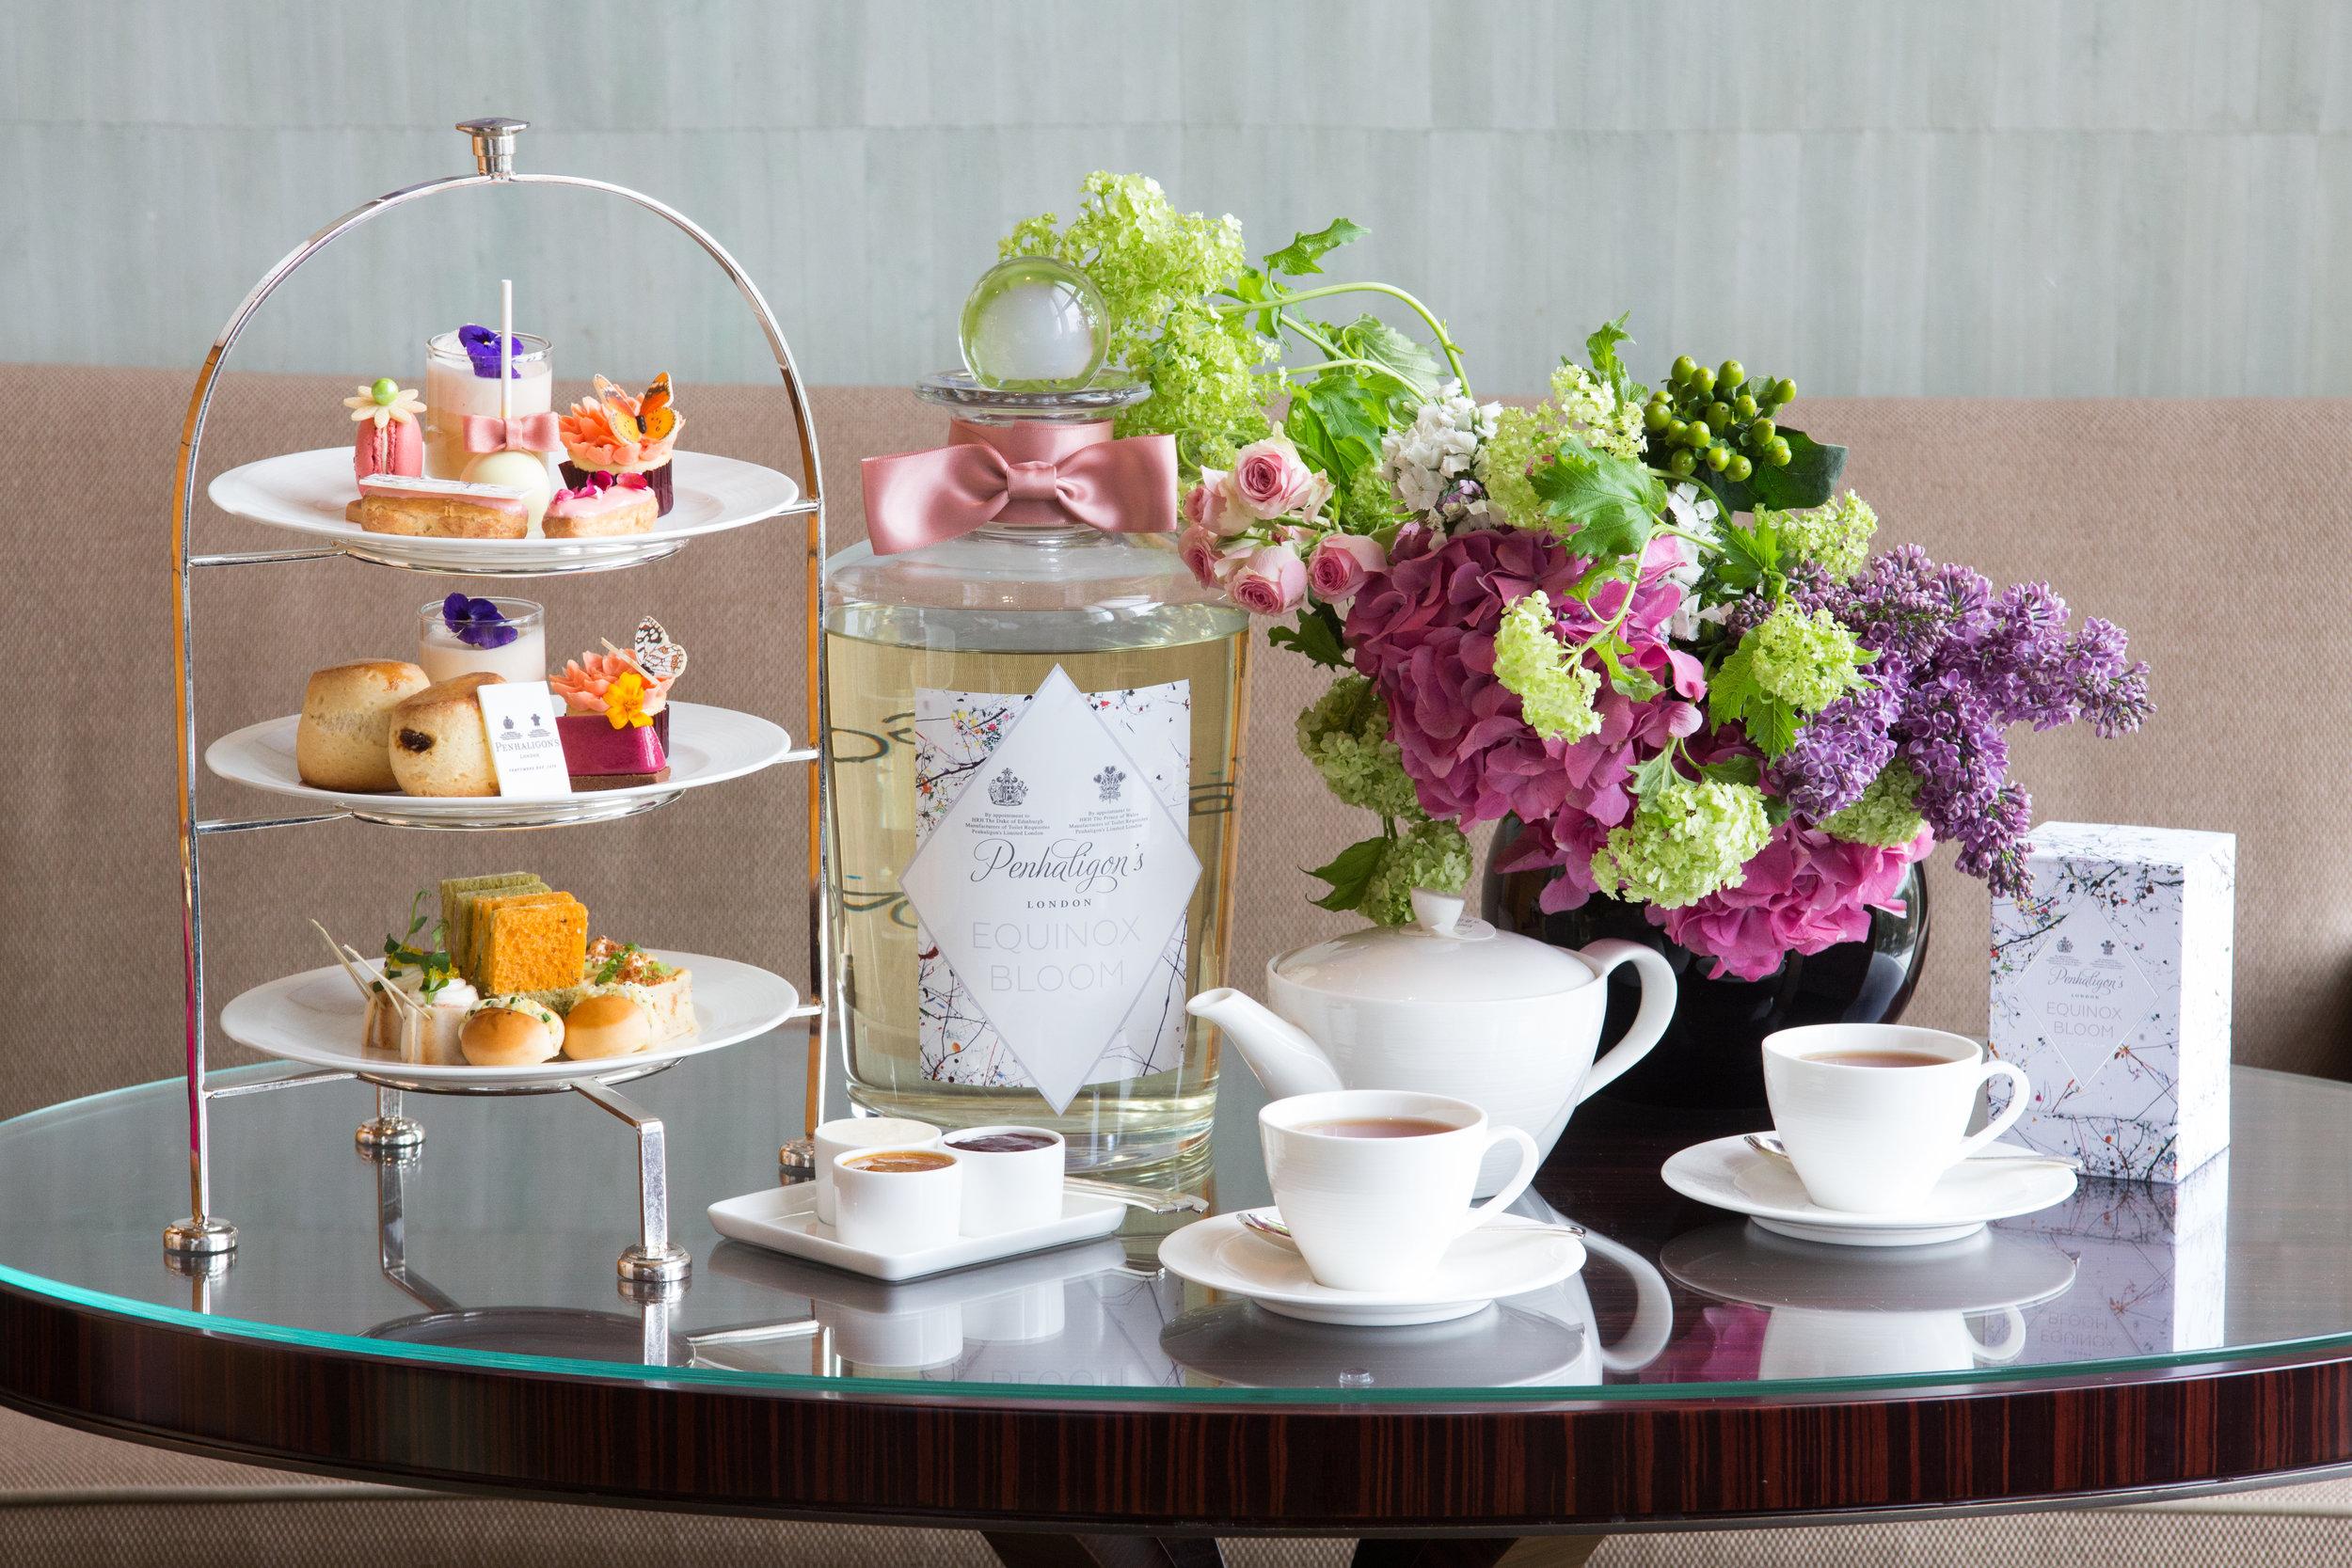 Four Seasons x Penhaligons Mother's Day Tea